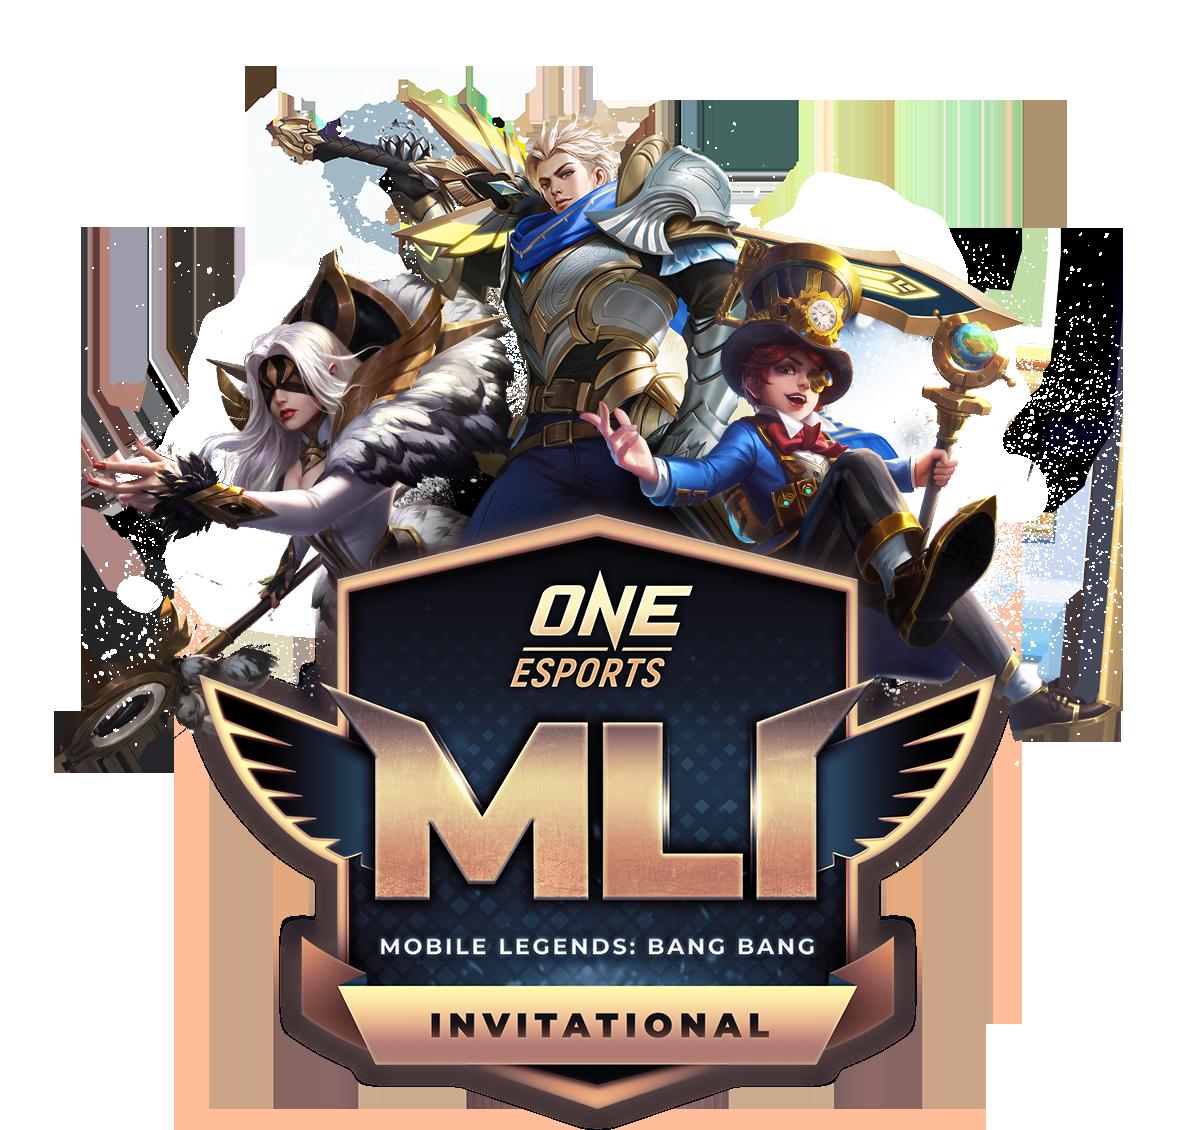 ONE Esports Mobile Legend, Bang Bang